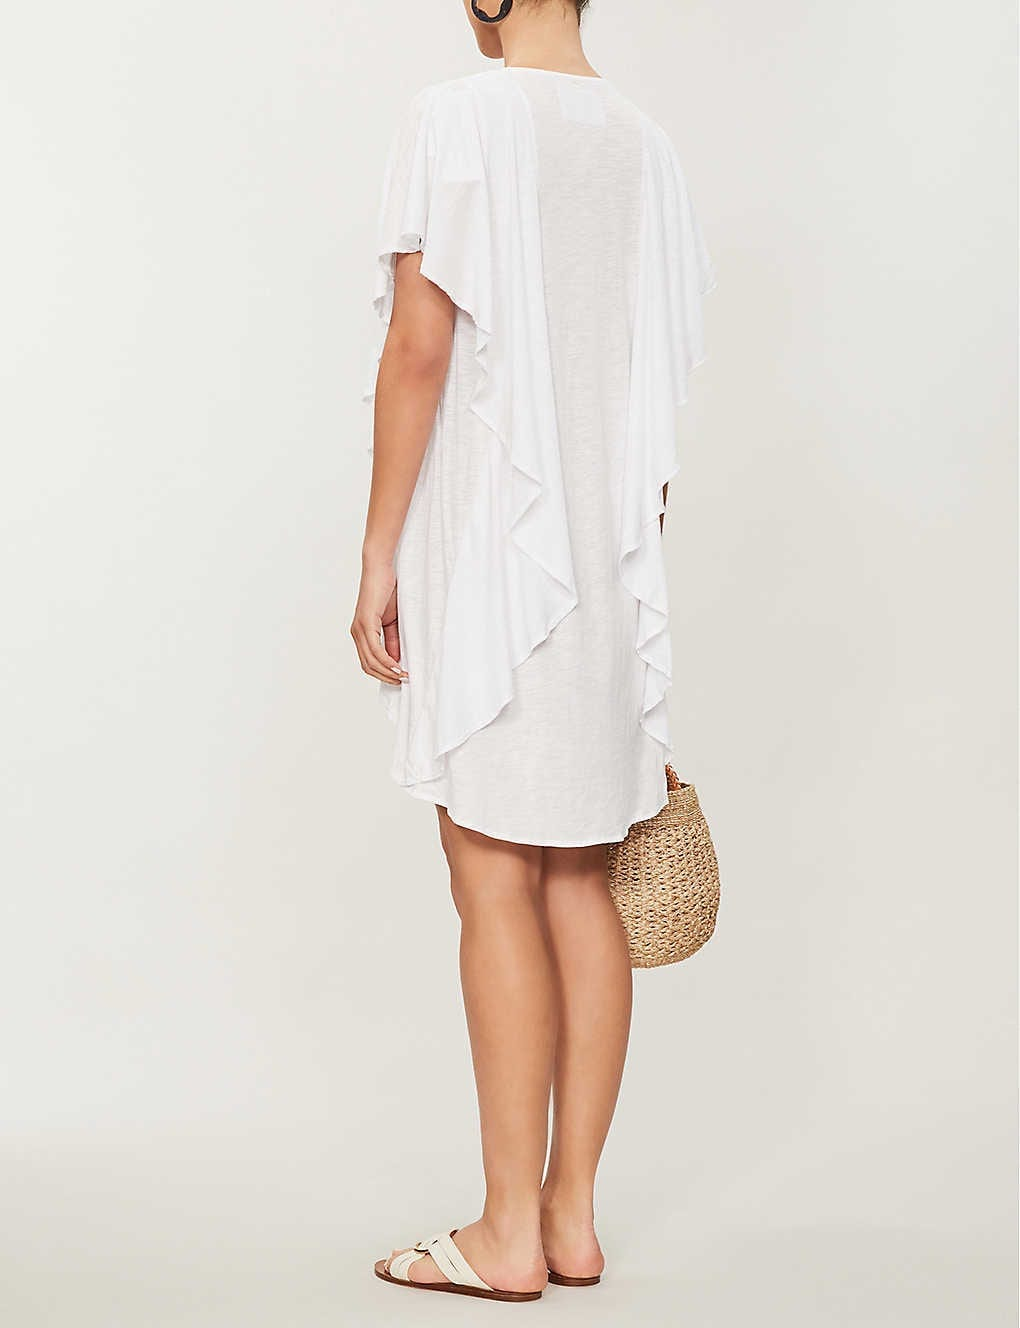 PITUSA Patterned-Neck Ruffled Cotton-Blend Jersey White Dress